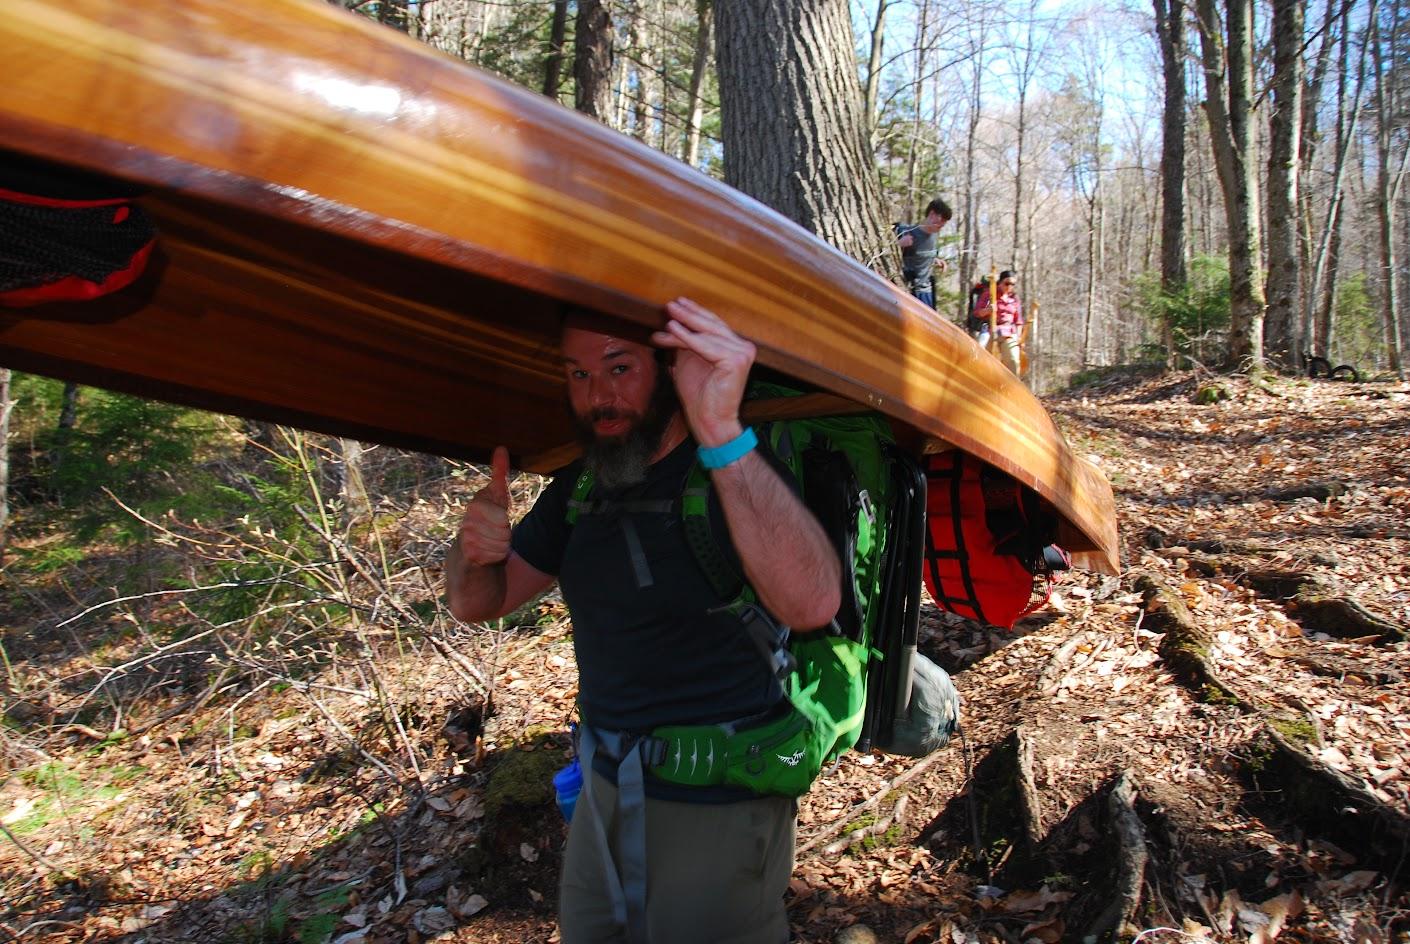 Fish Pond St Regis Canoe Wilderness Area Forums